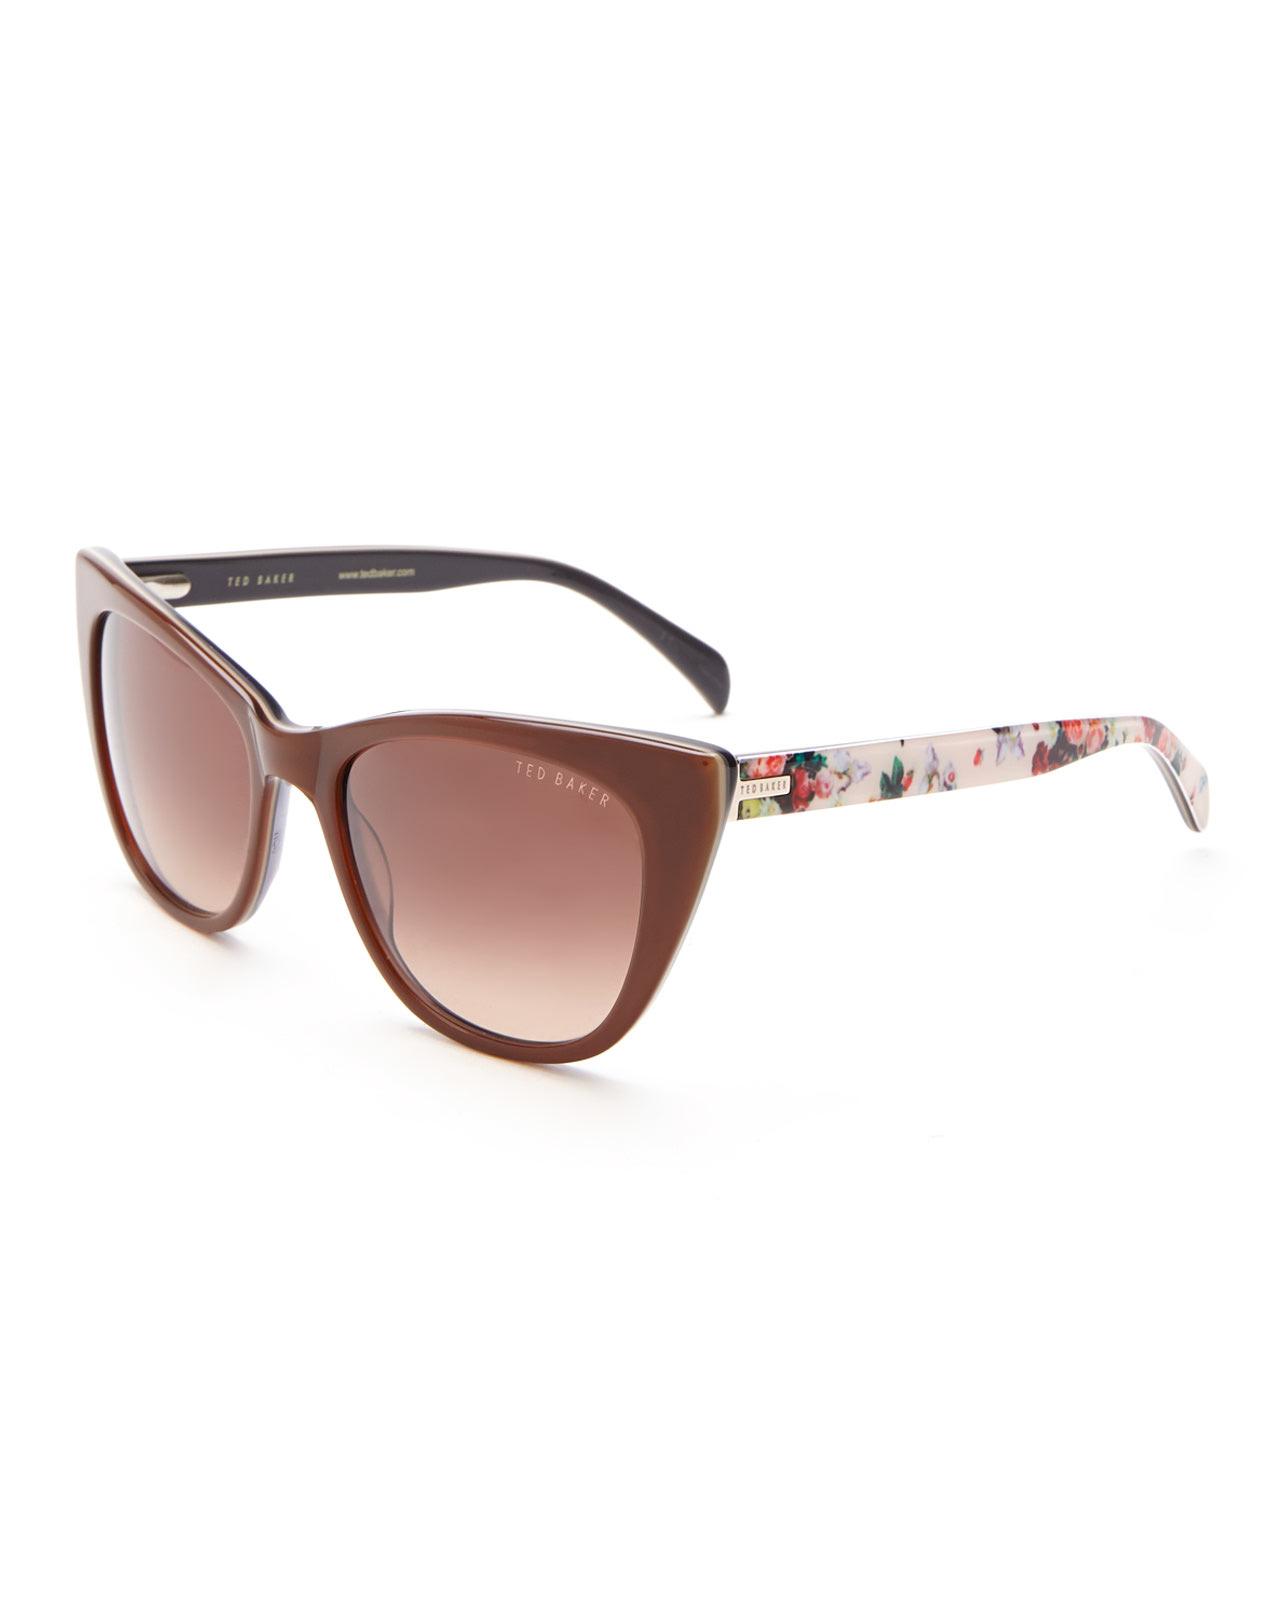 Sunglasses Unisex Oliver Sunglasses Ted Baker GZRgjGL